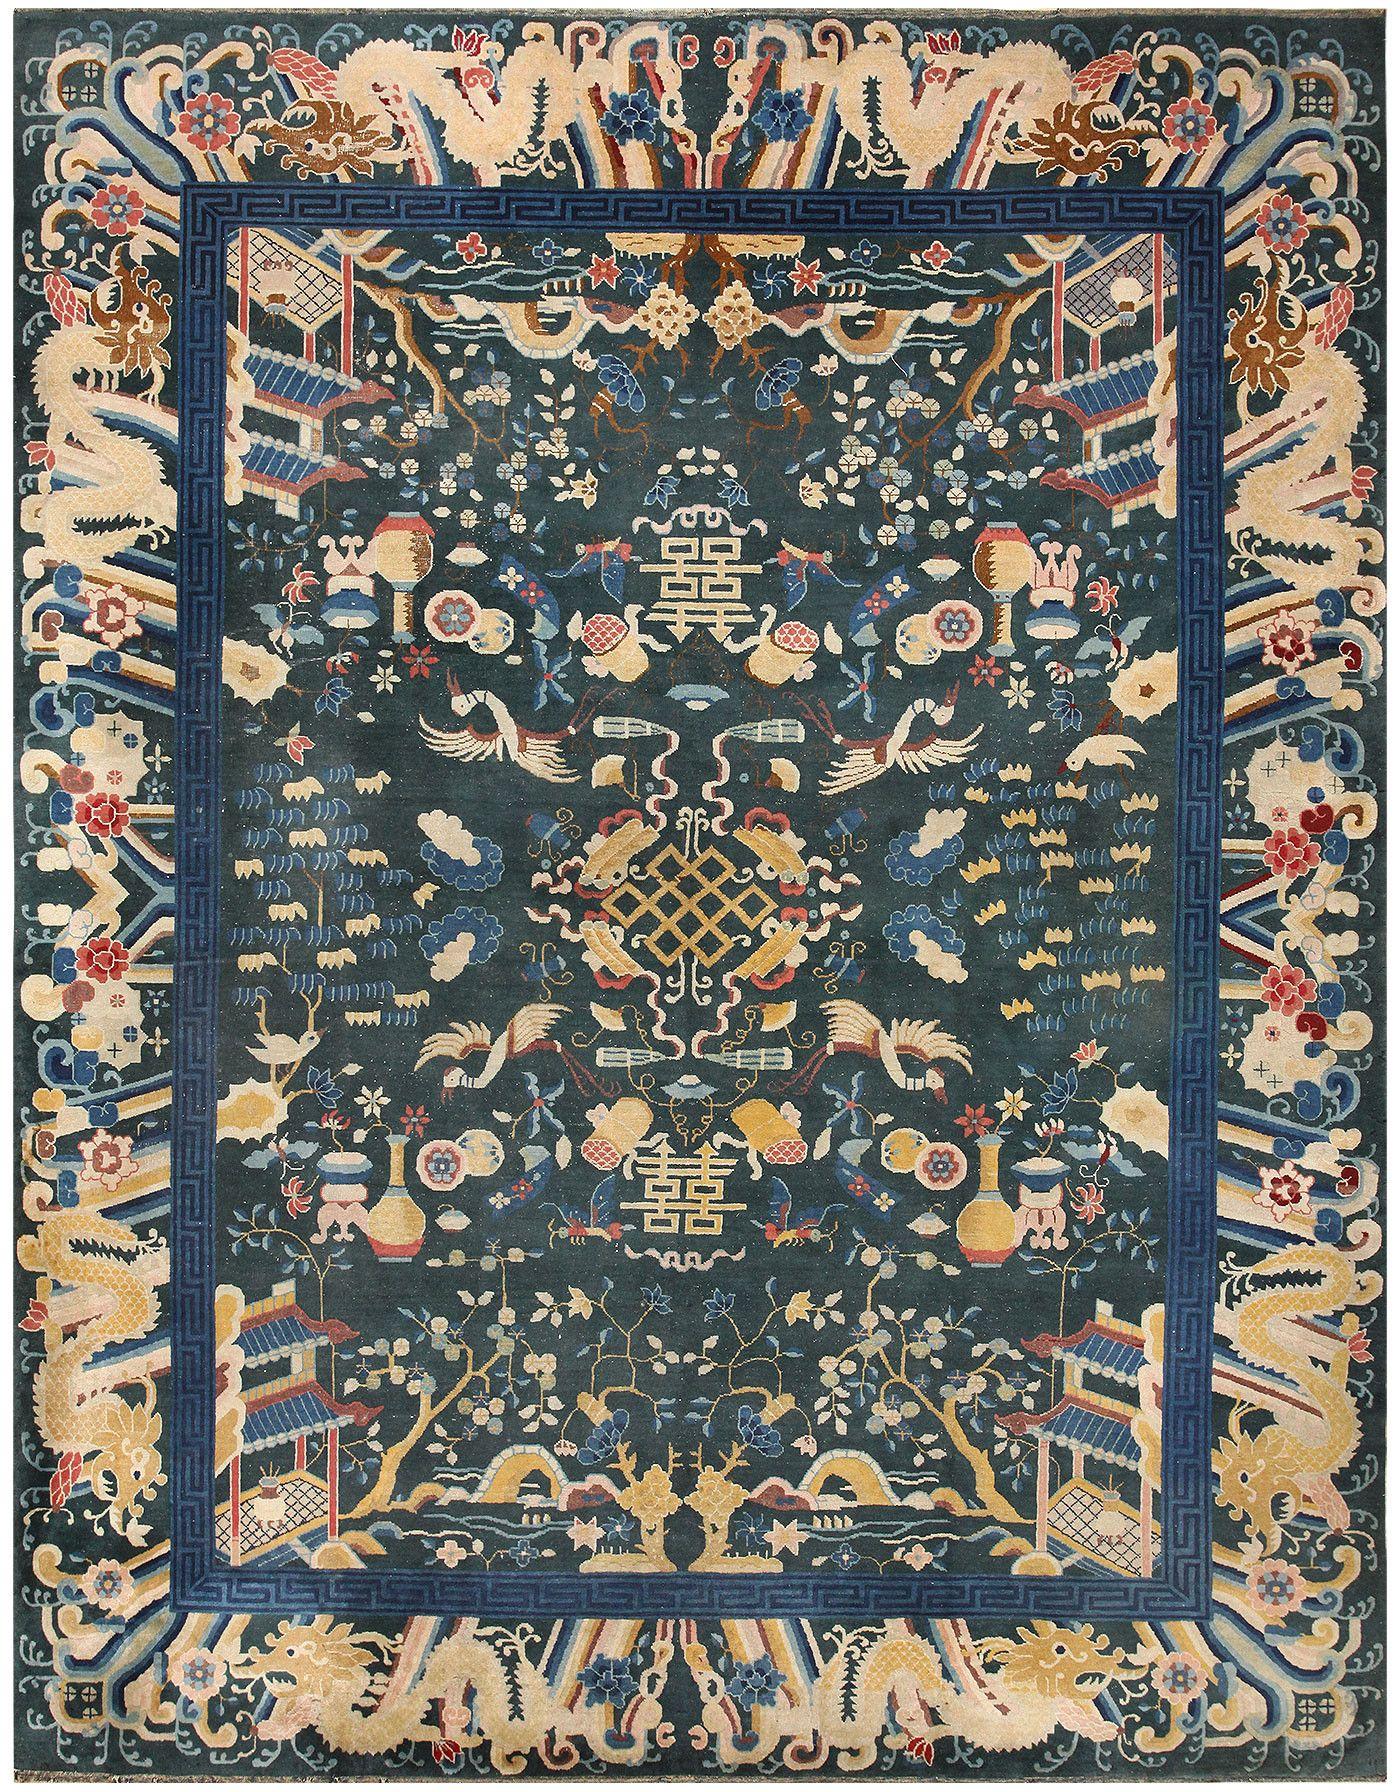 Rare Antique Dark Green Chinese Rug 48430 By Nazmiyal Antique Rugs Antique Carpets Animal Rug